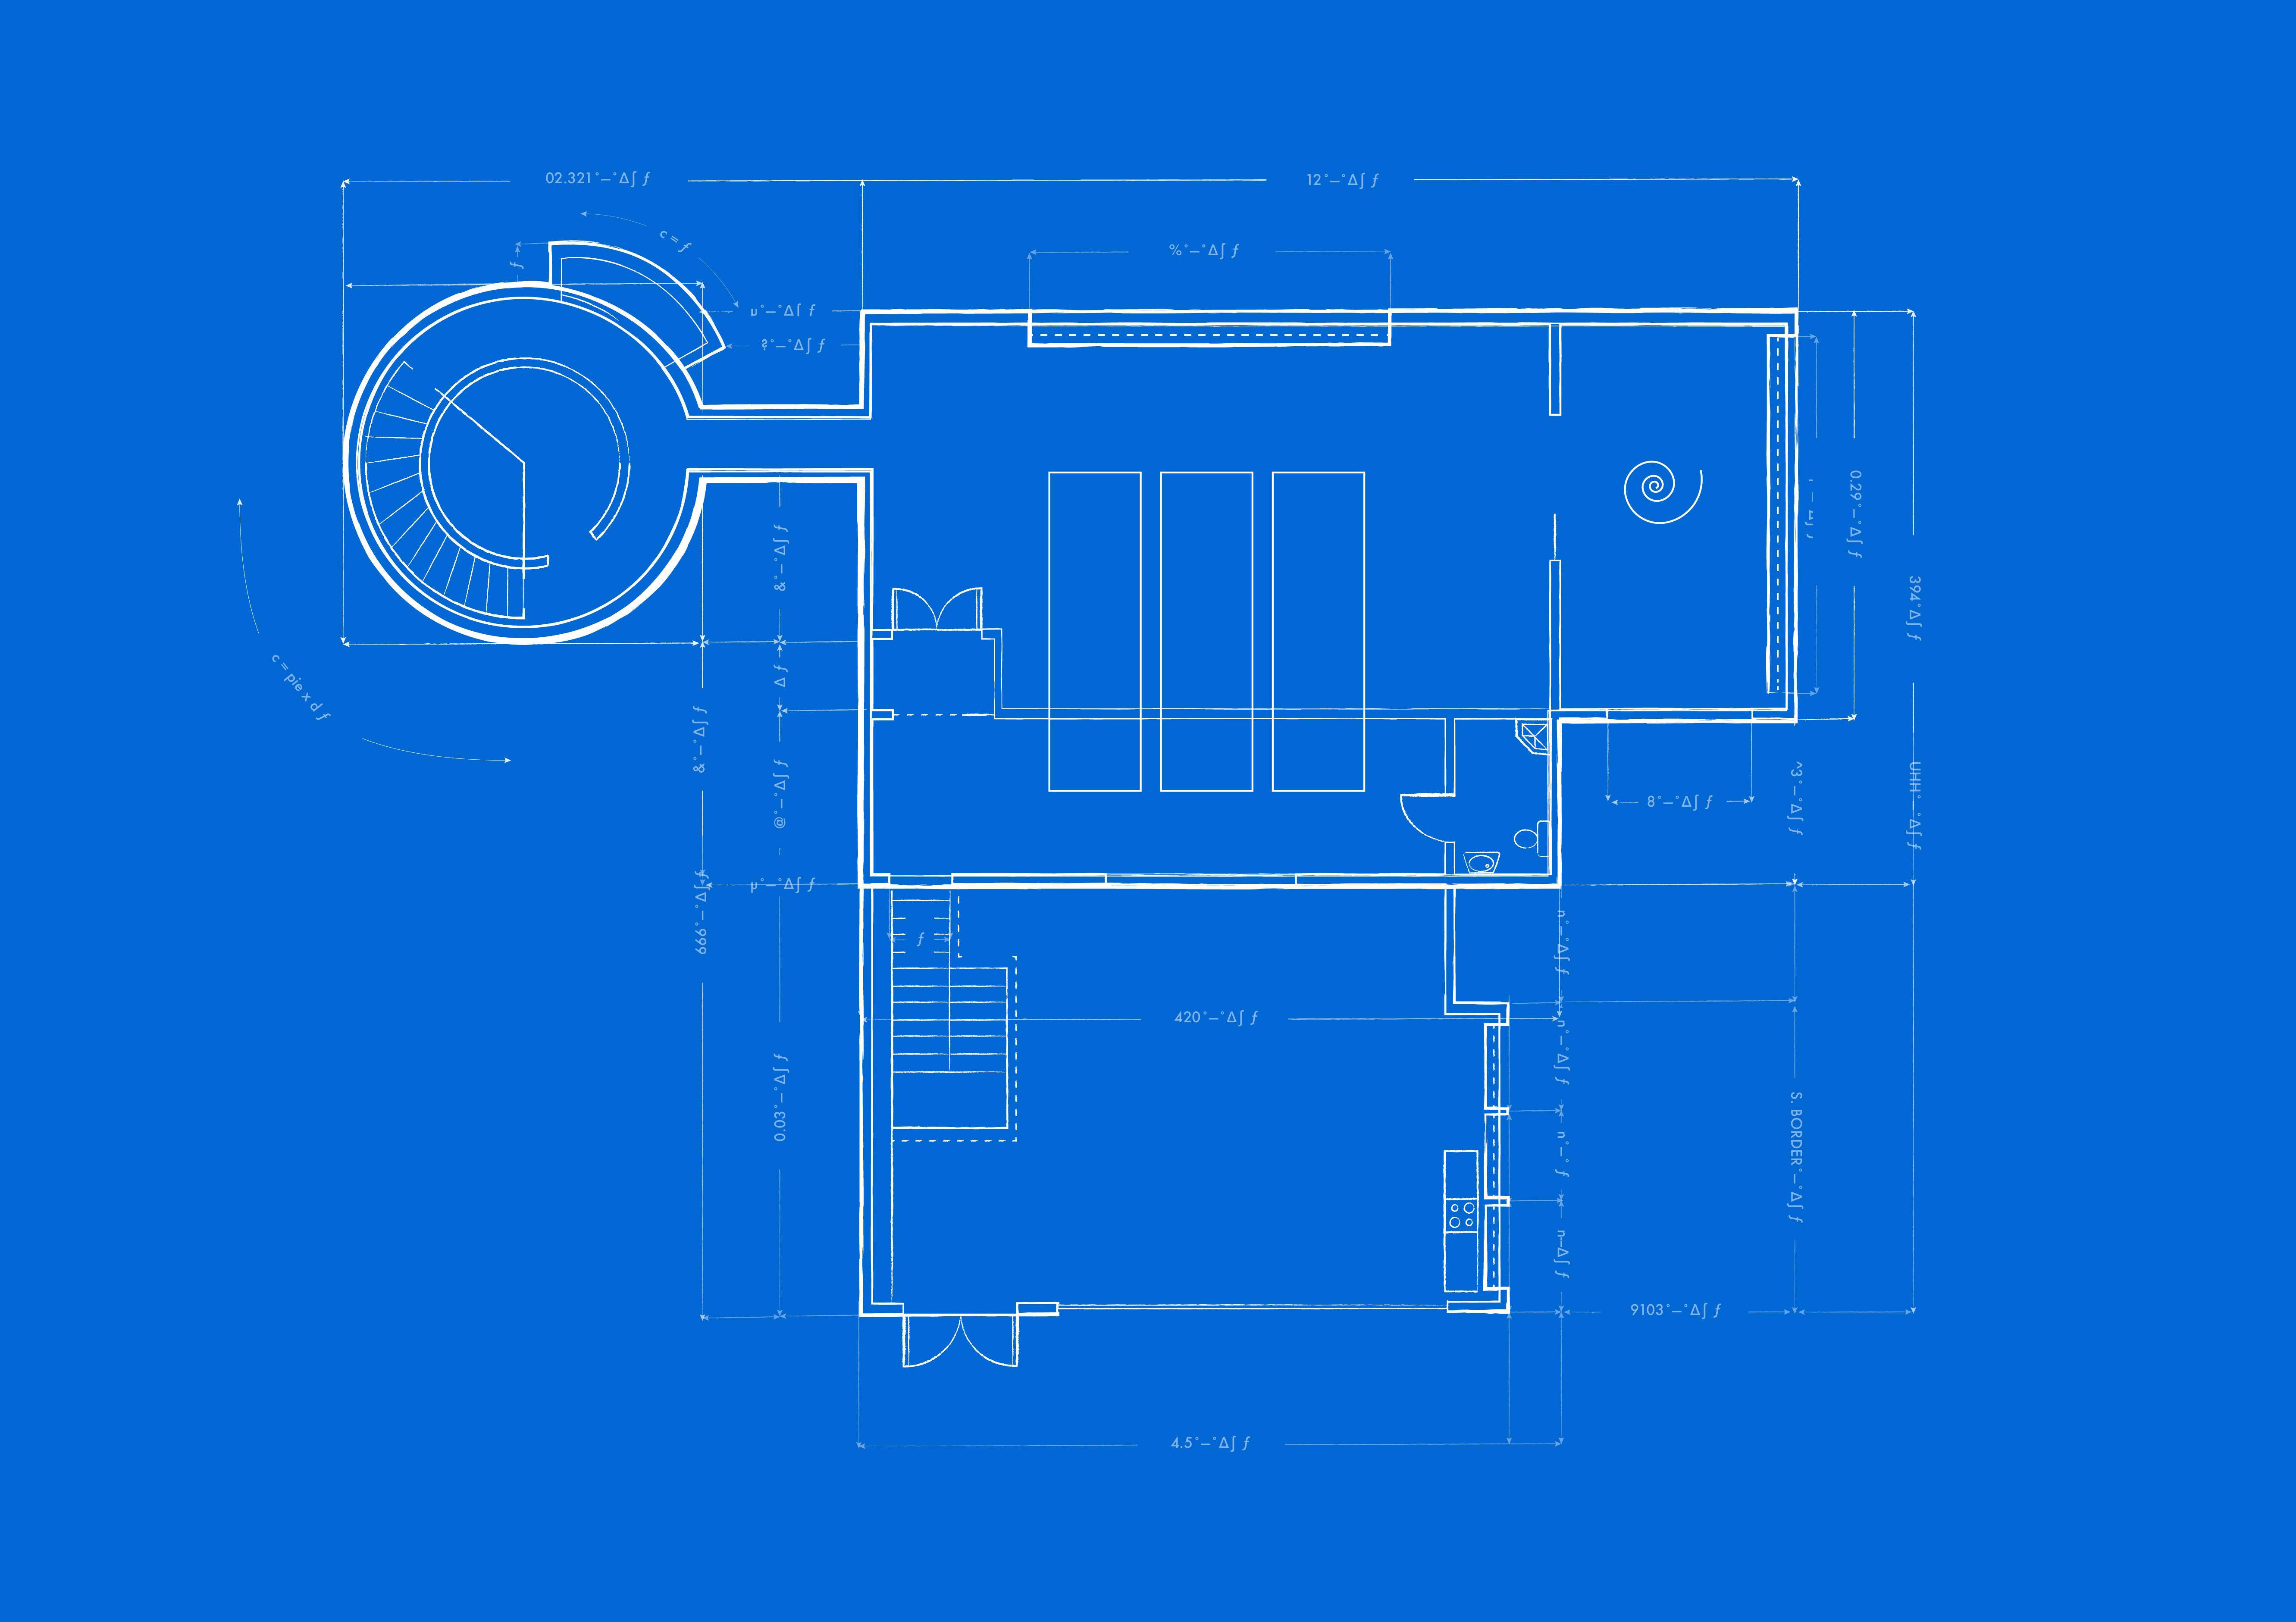 freyron_cafe_blueprint02